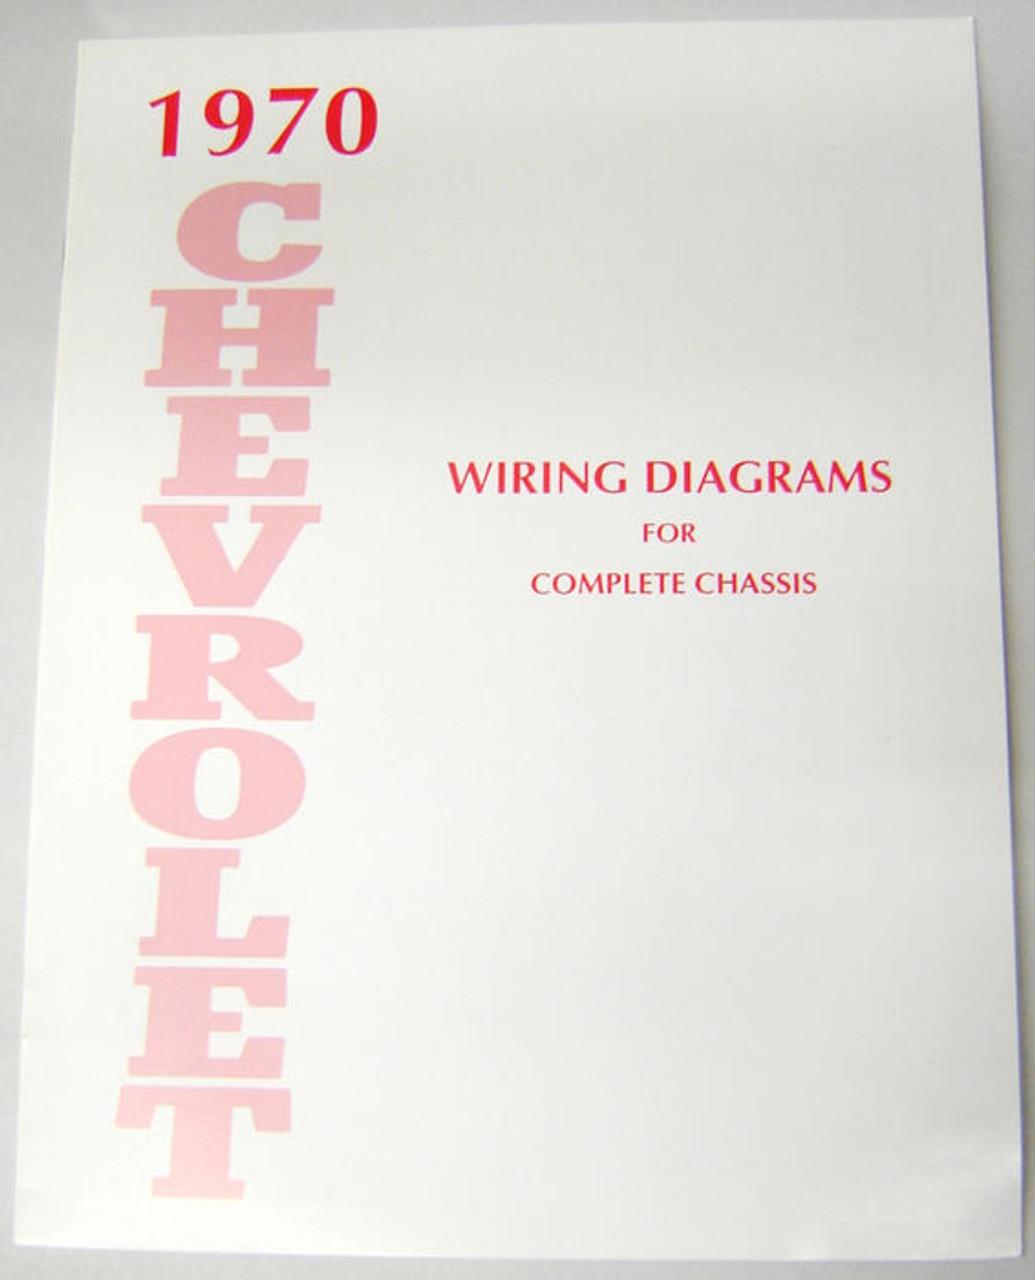 L1030_zpsdmo7usx7__14739.1443559727?c=2 70 chevy nova electrical wiring diagram manual 1970 i 5 classic 1972 chevy impala wiring diagram at edmiracle.co